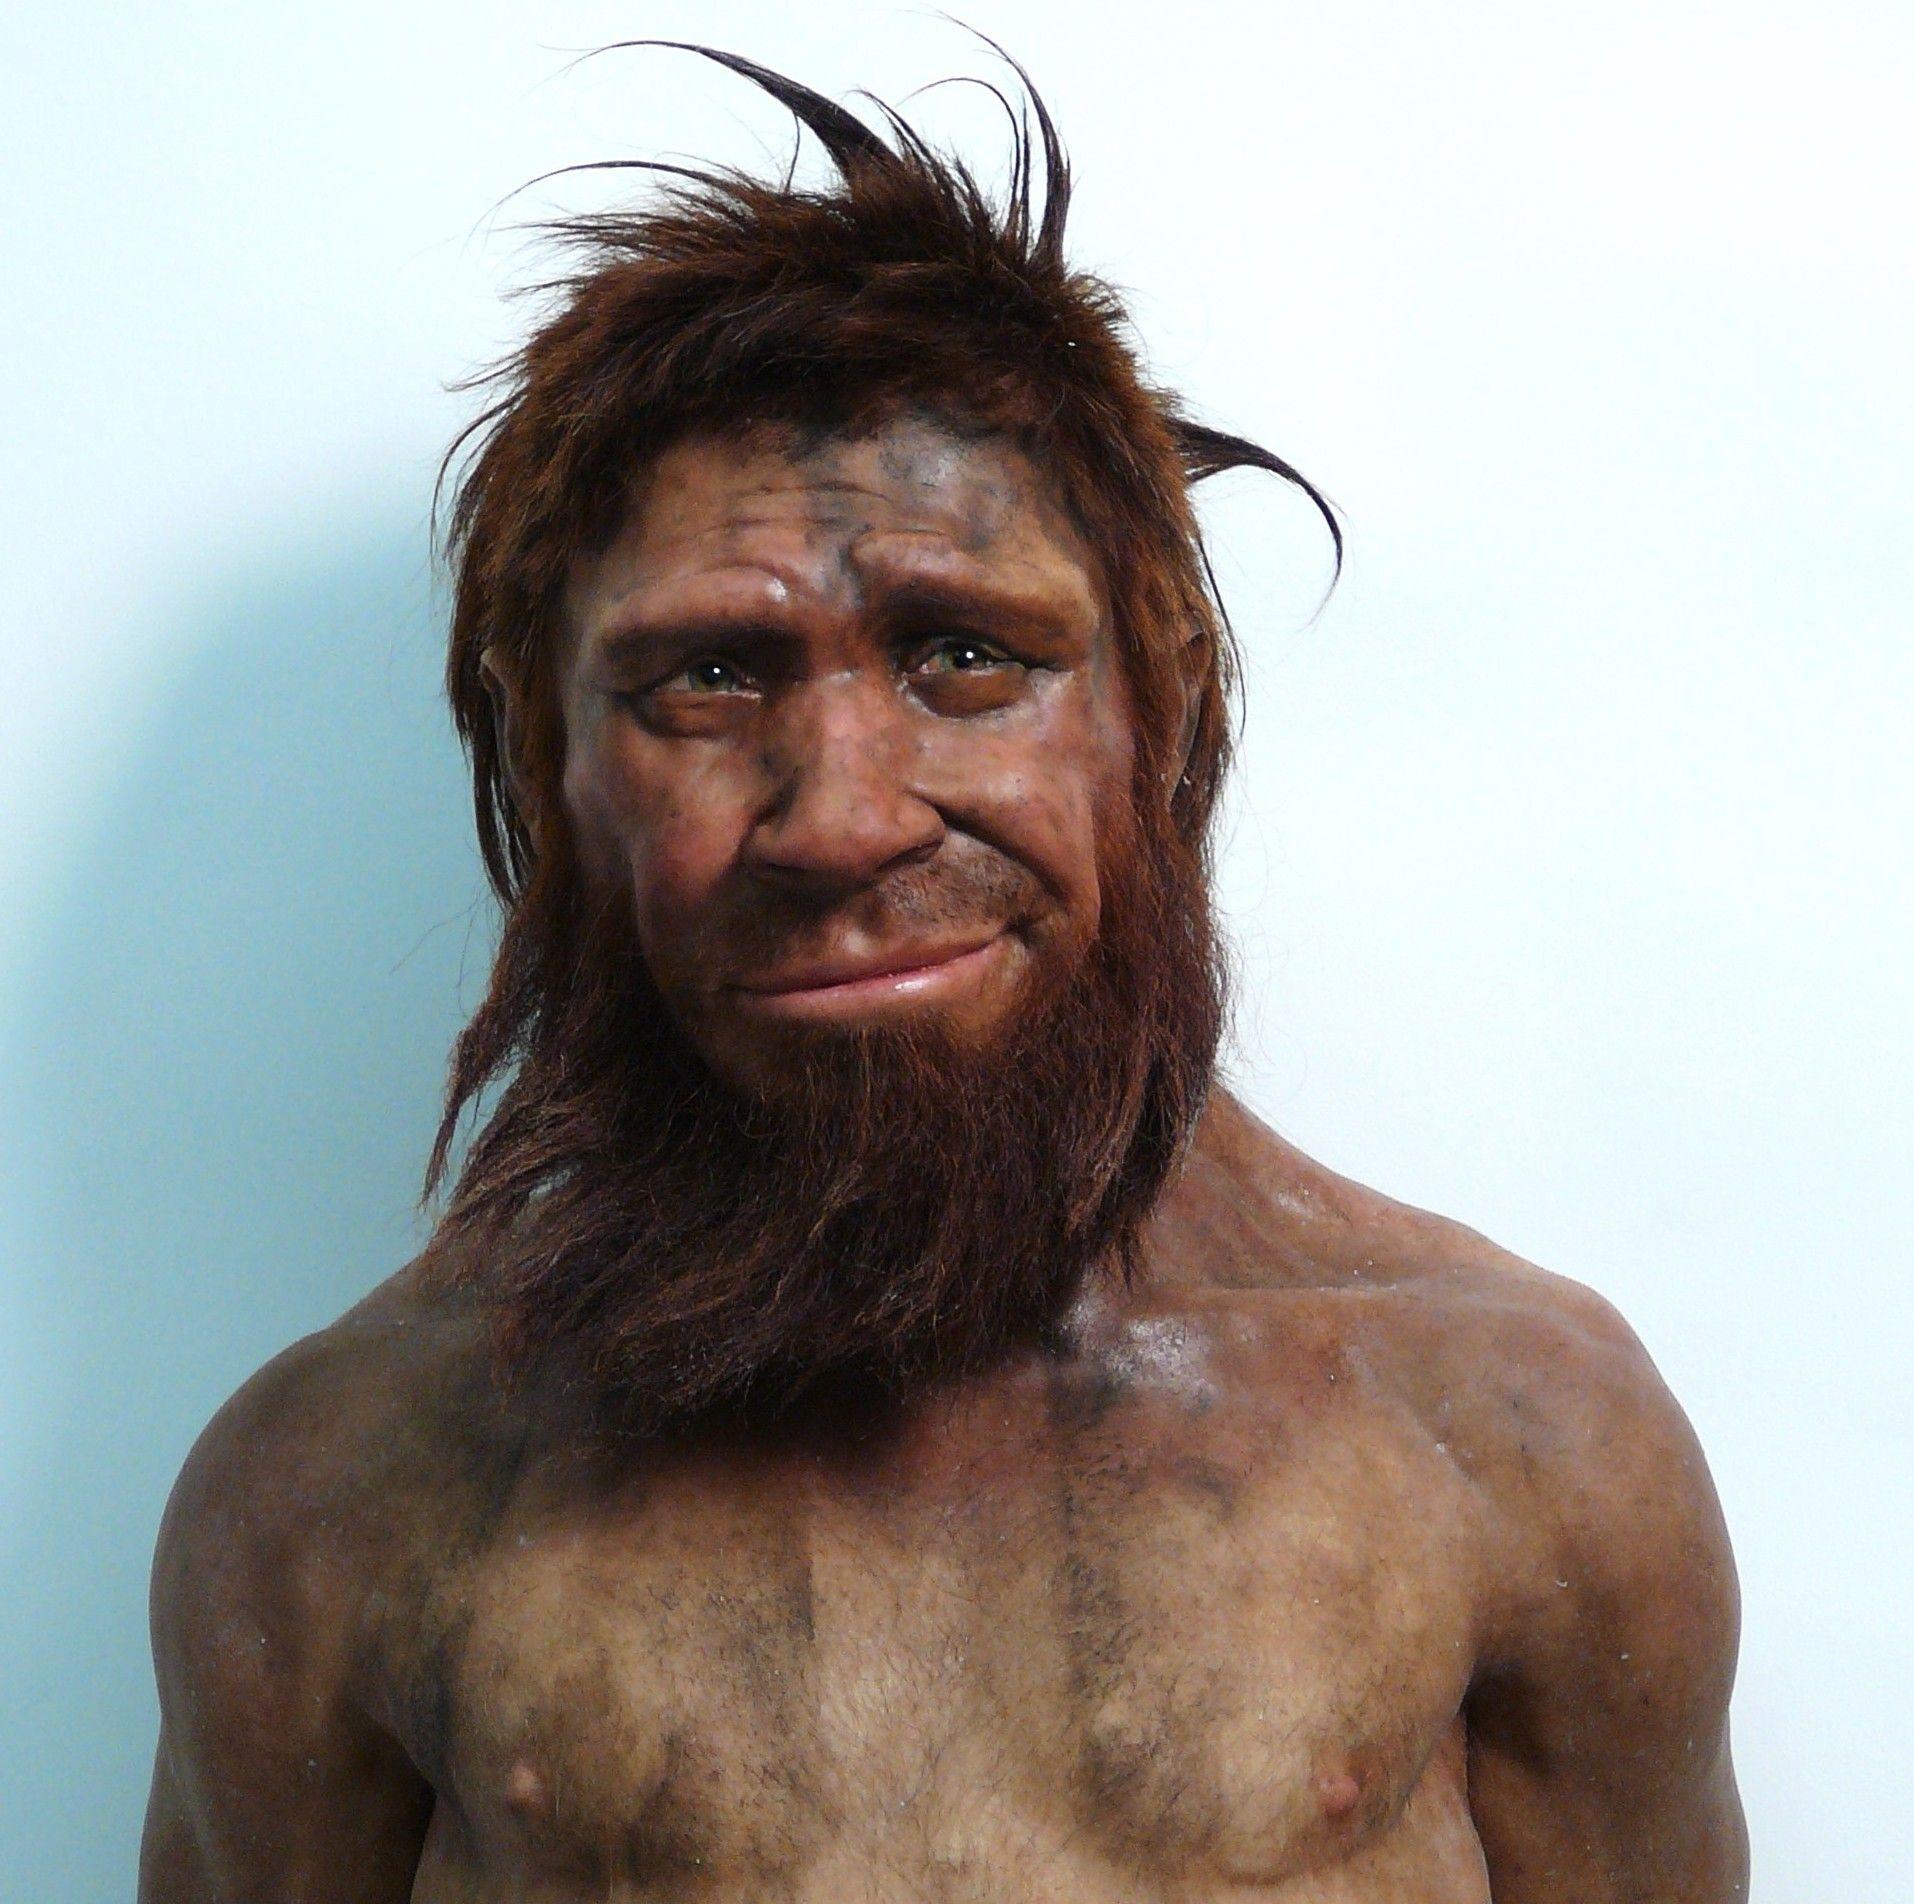 facial reconstruction neanderthal spy - Google Search   Human ...